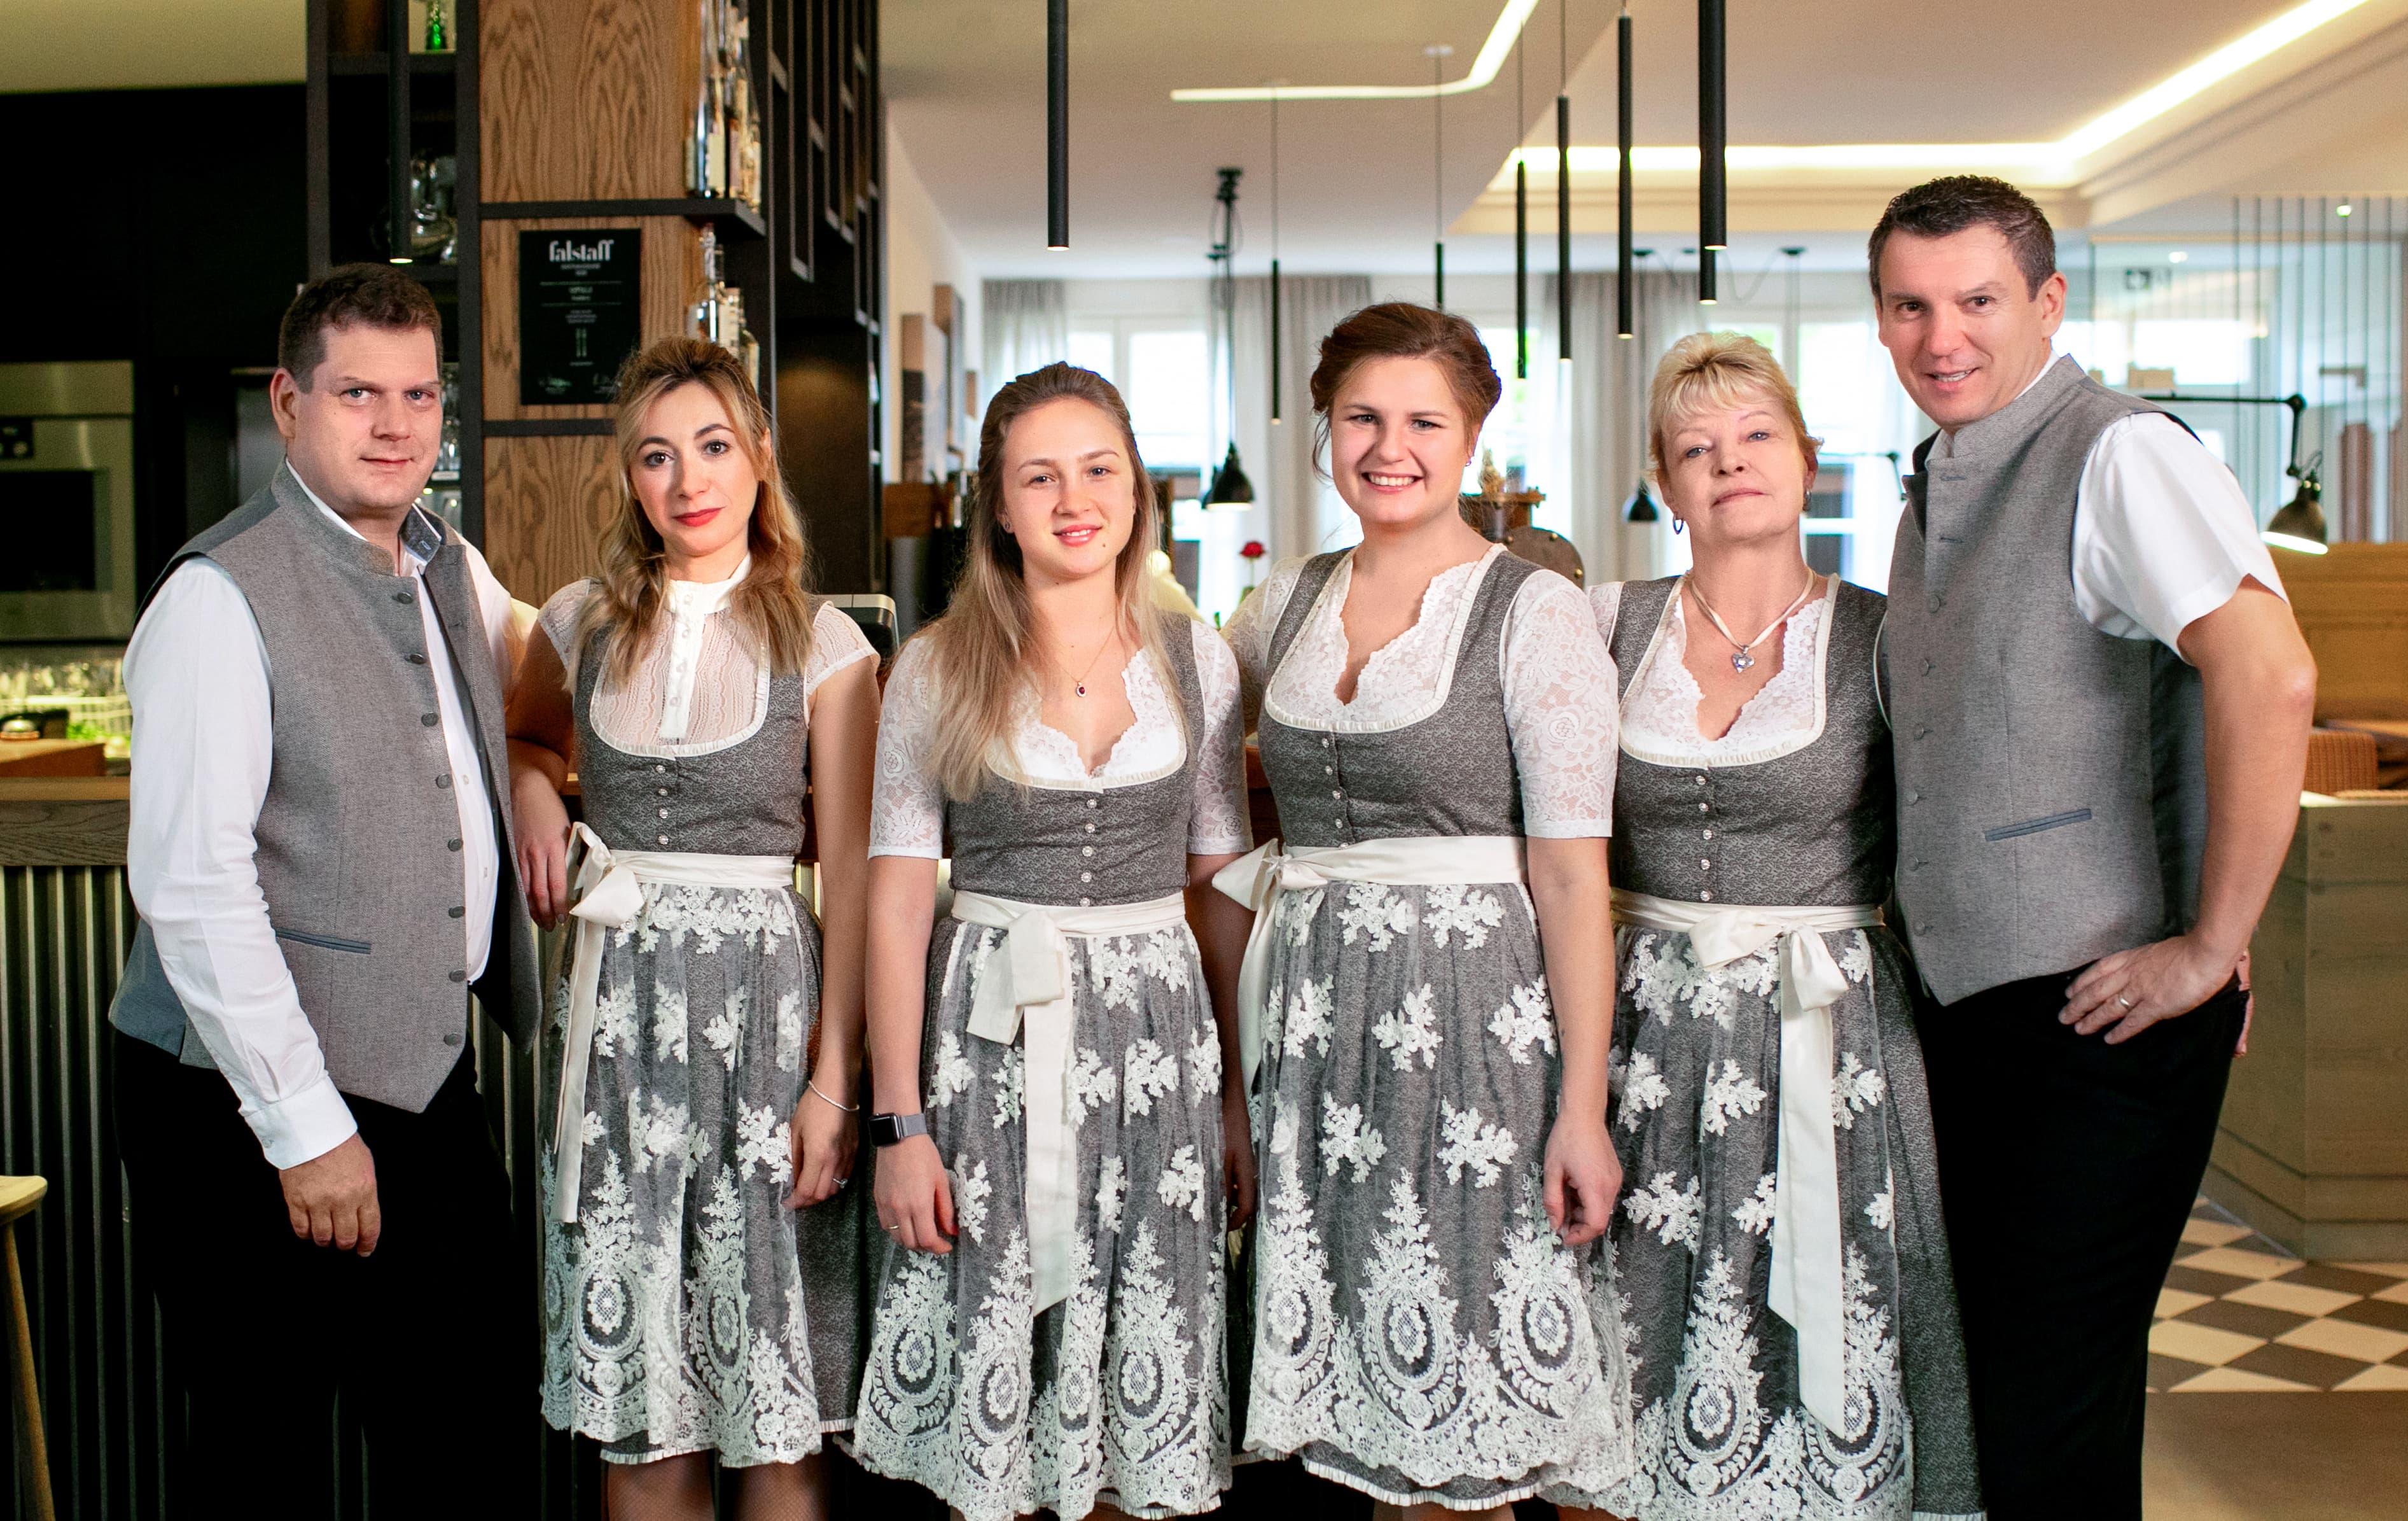 Gasthaus Settele team